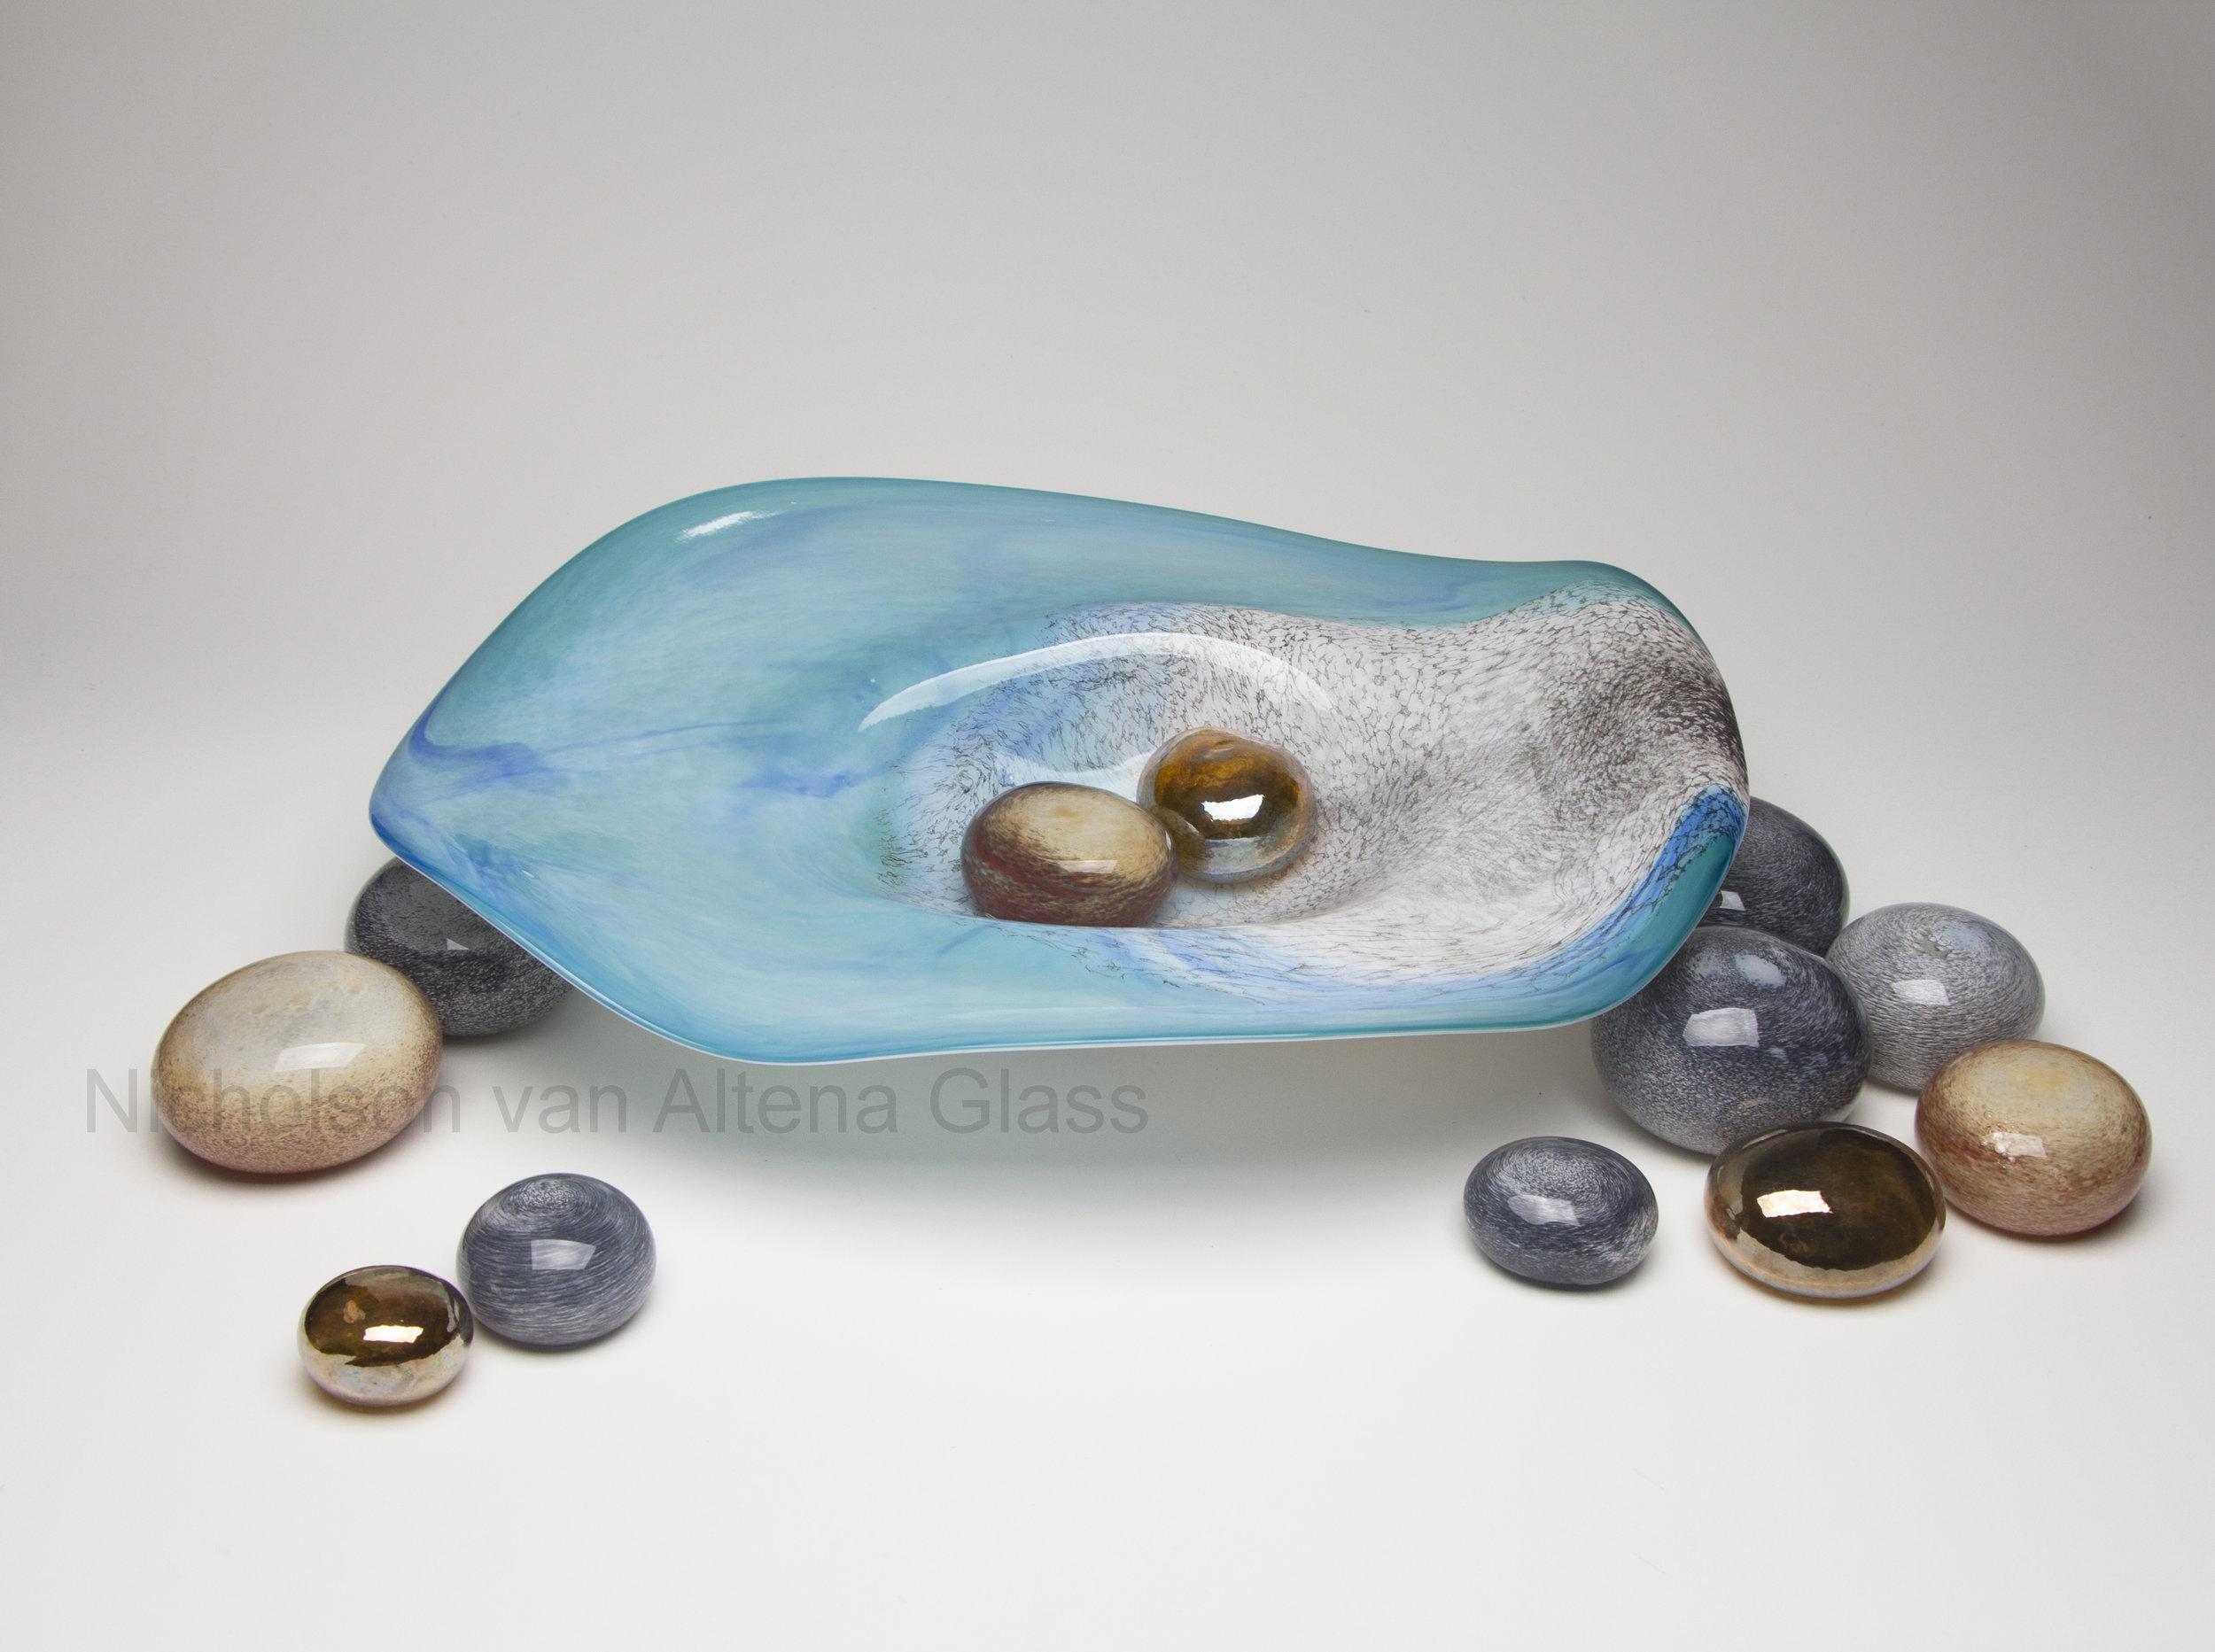 Tributary Bowl & Stones